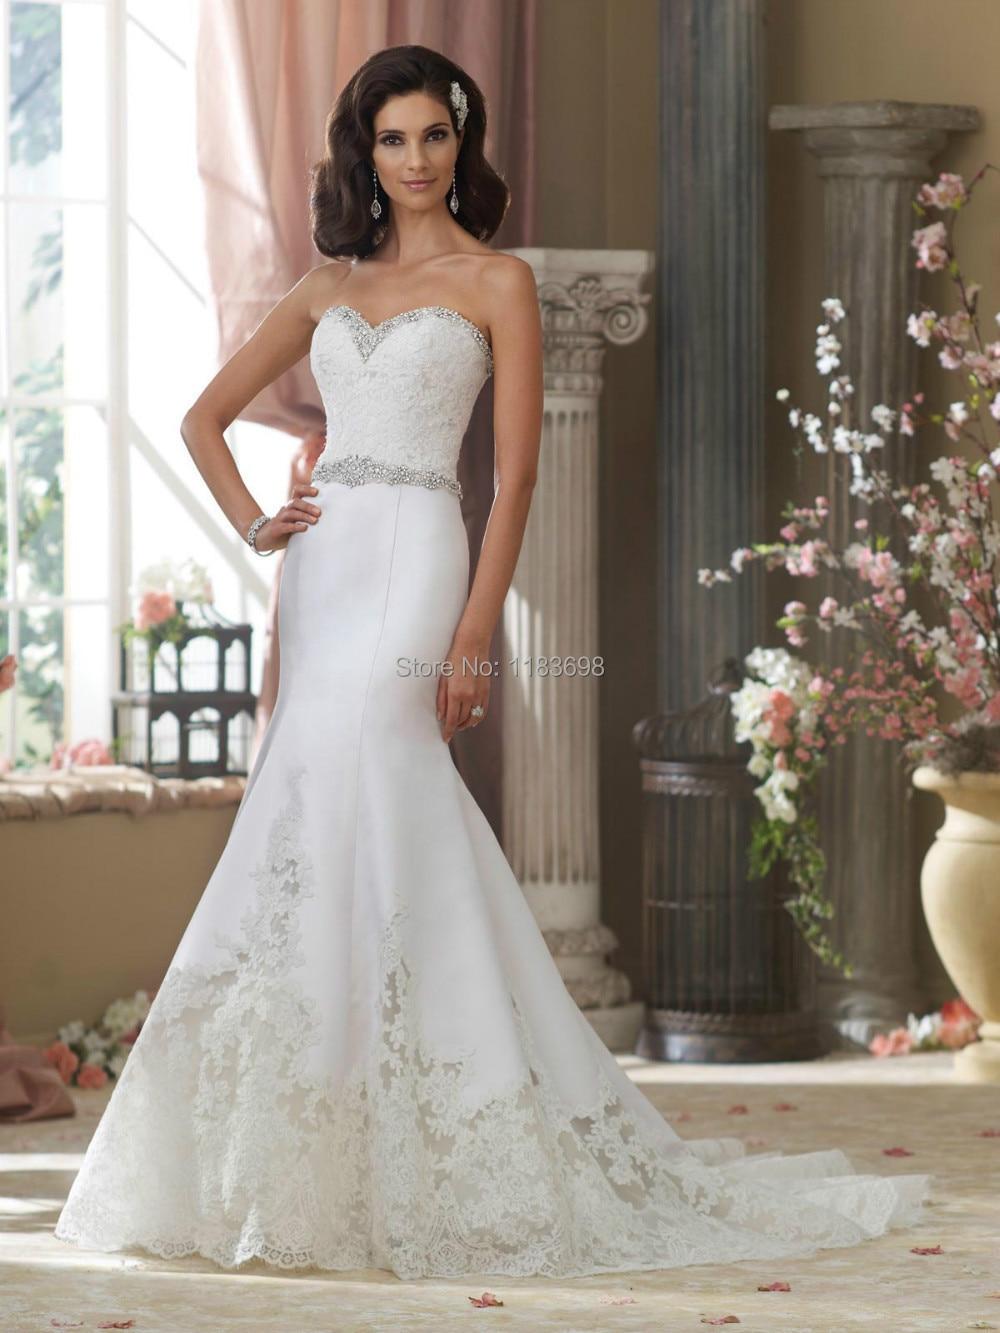 High Quality Simple Unique Lace Mermaid Wedding Dress